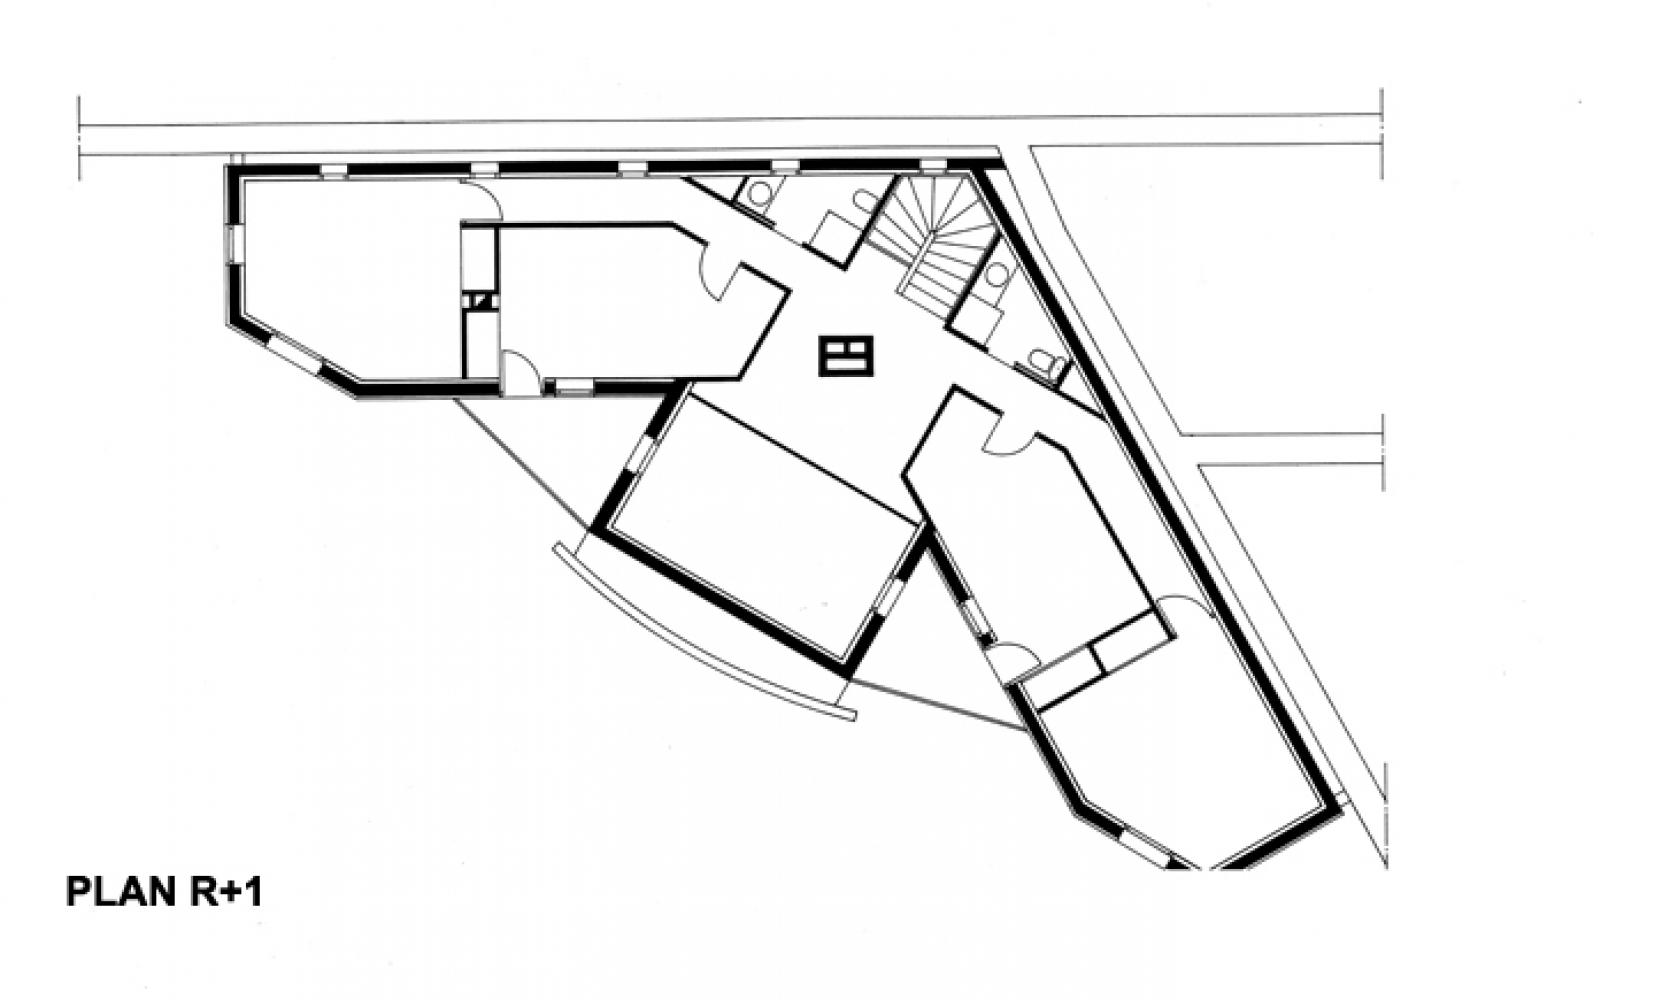 zmga---03 Pascale SEURIN Architecte - Pascale SEURIN Architecte